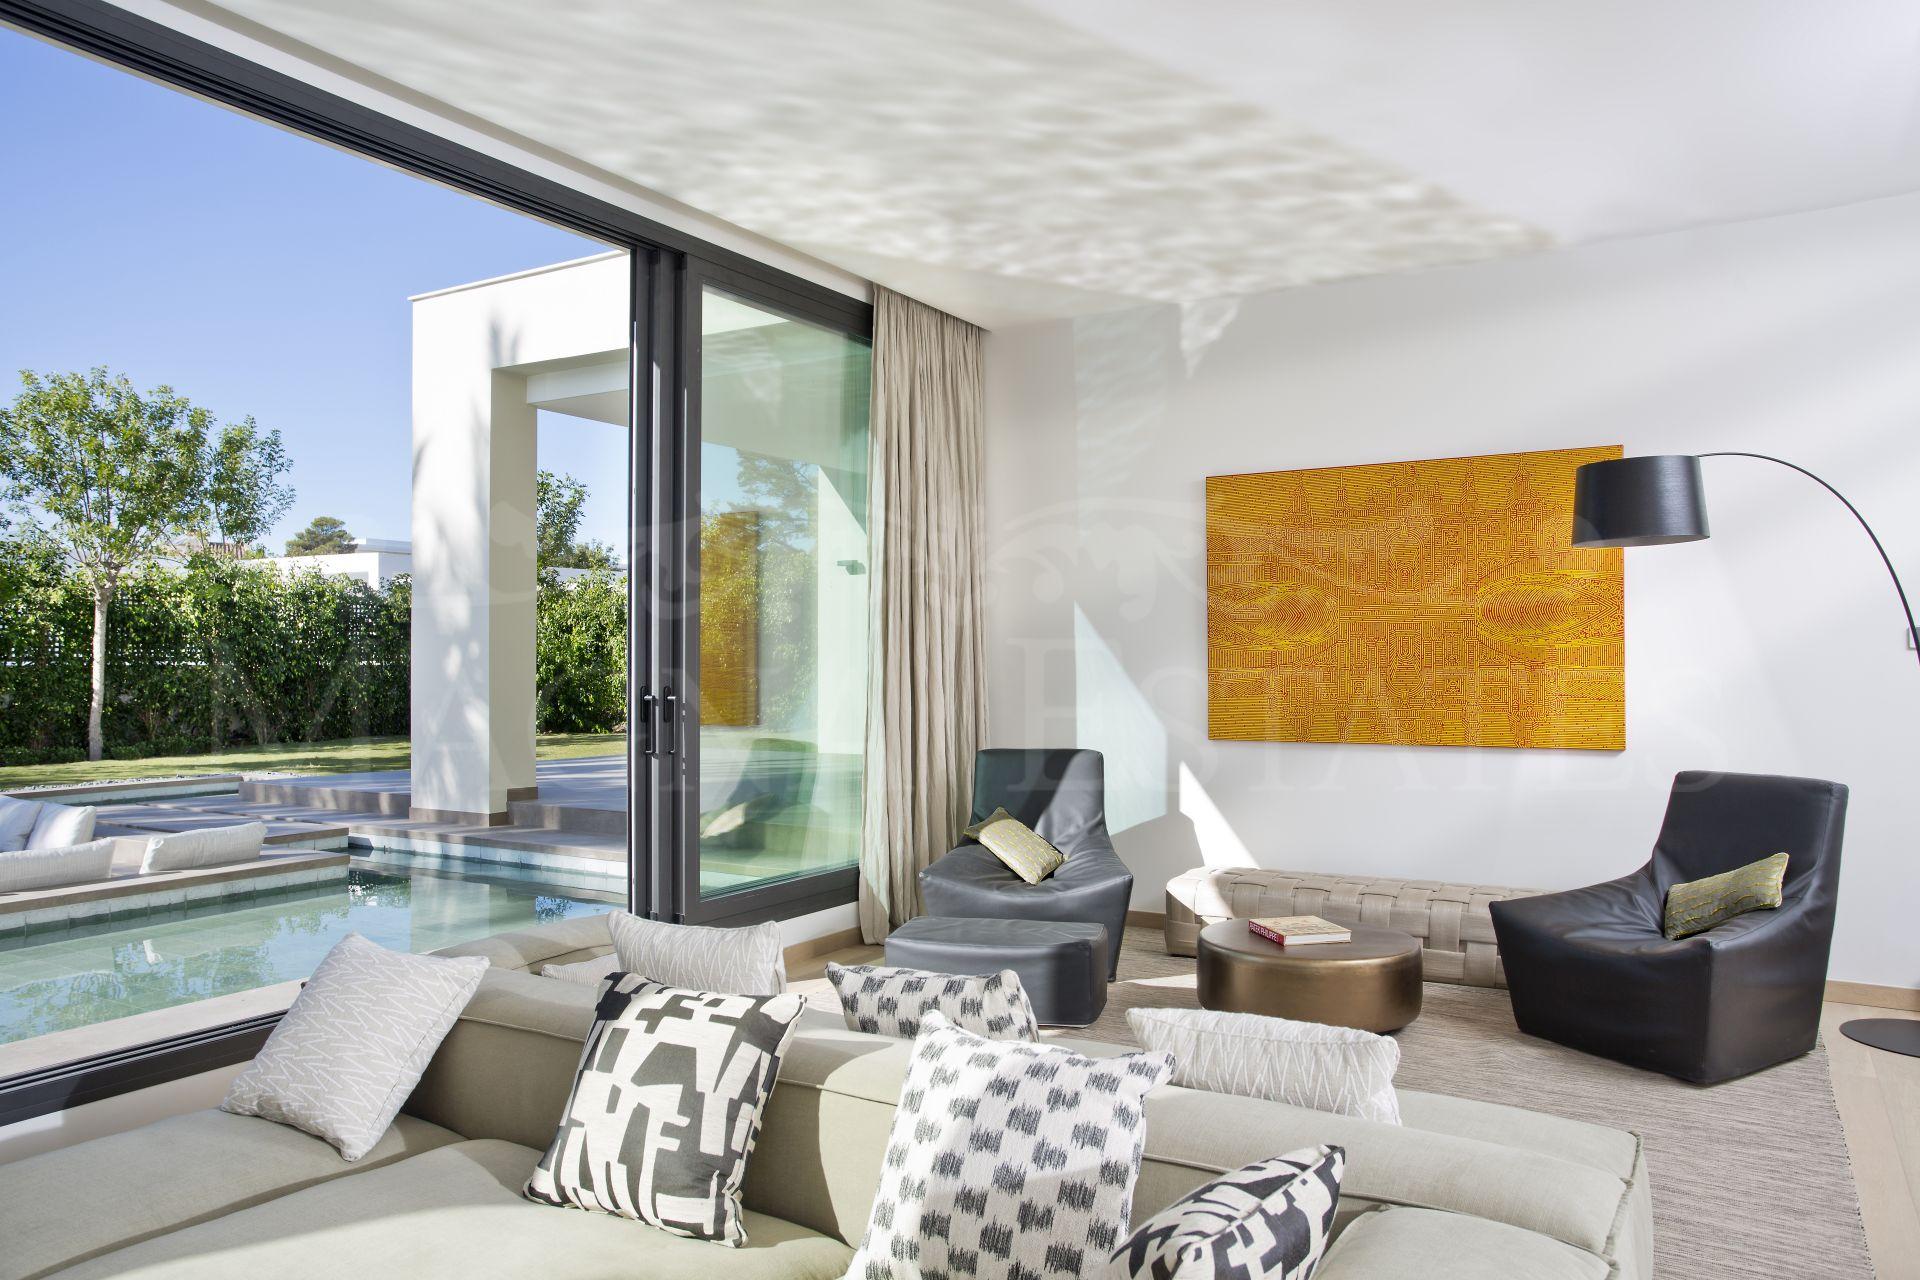 Brand new villa on the second line of the beach in Casasola, Guadalmina Baja.